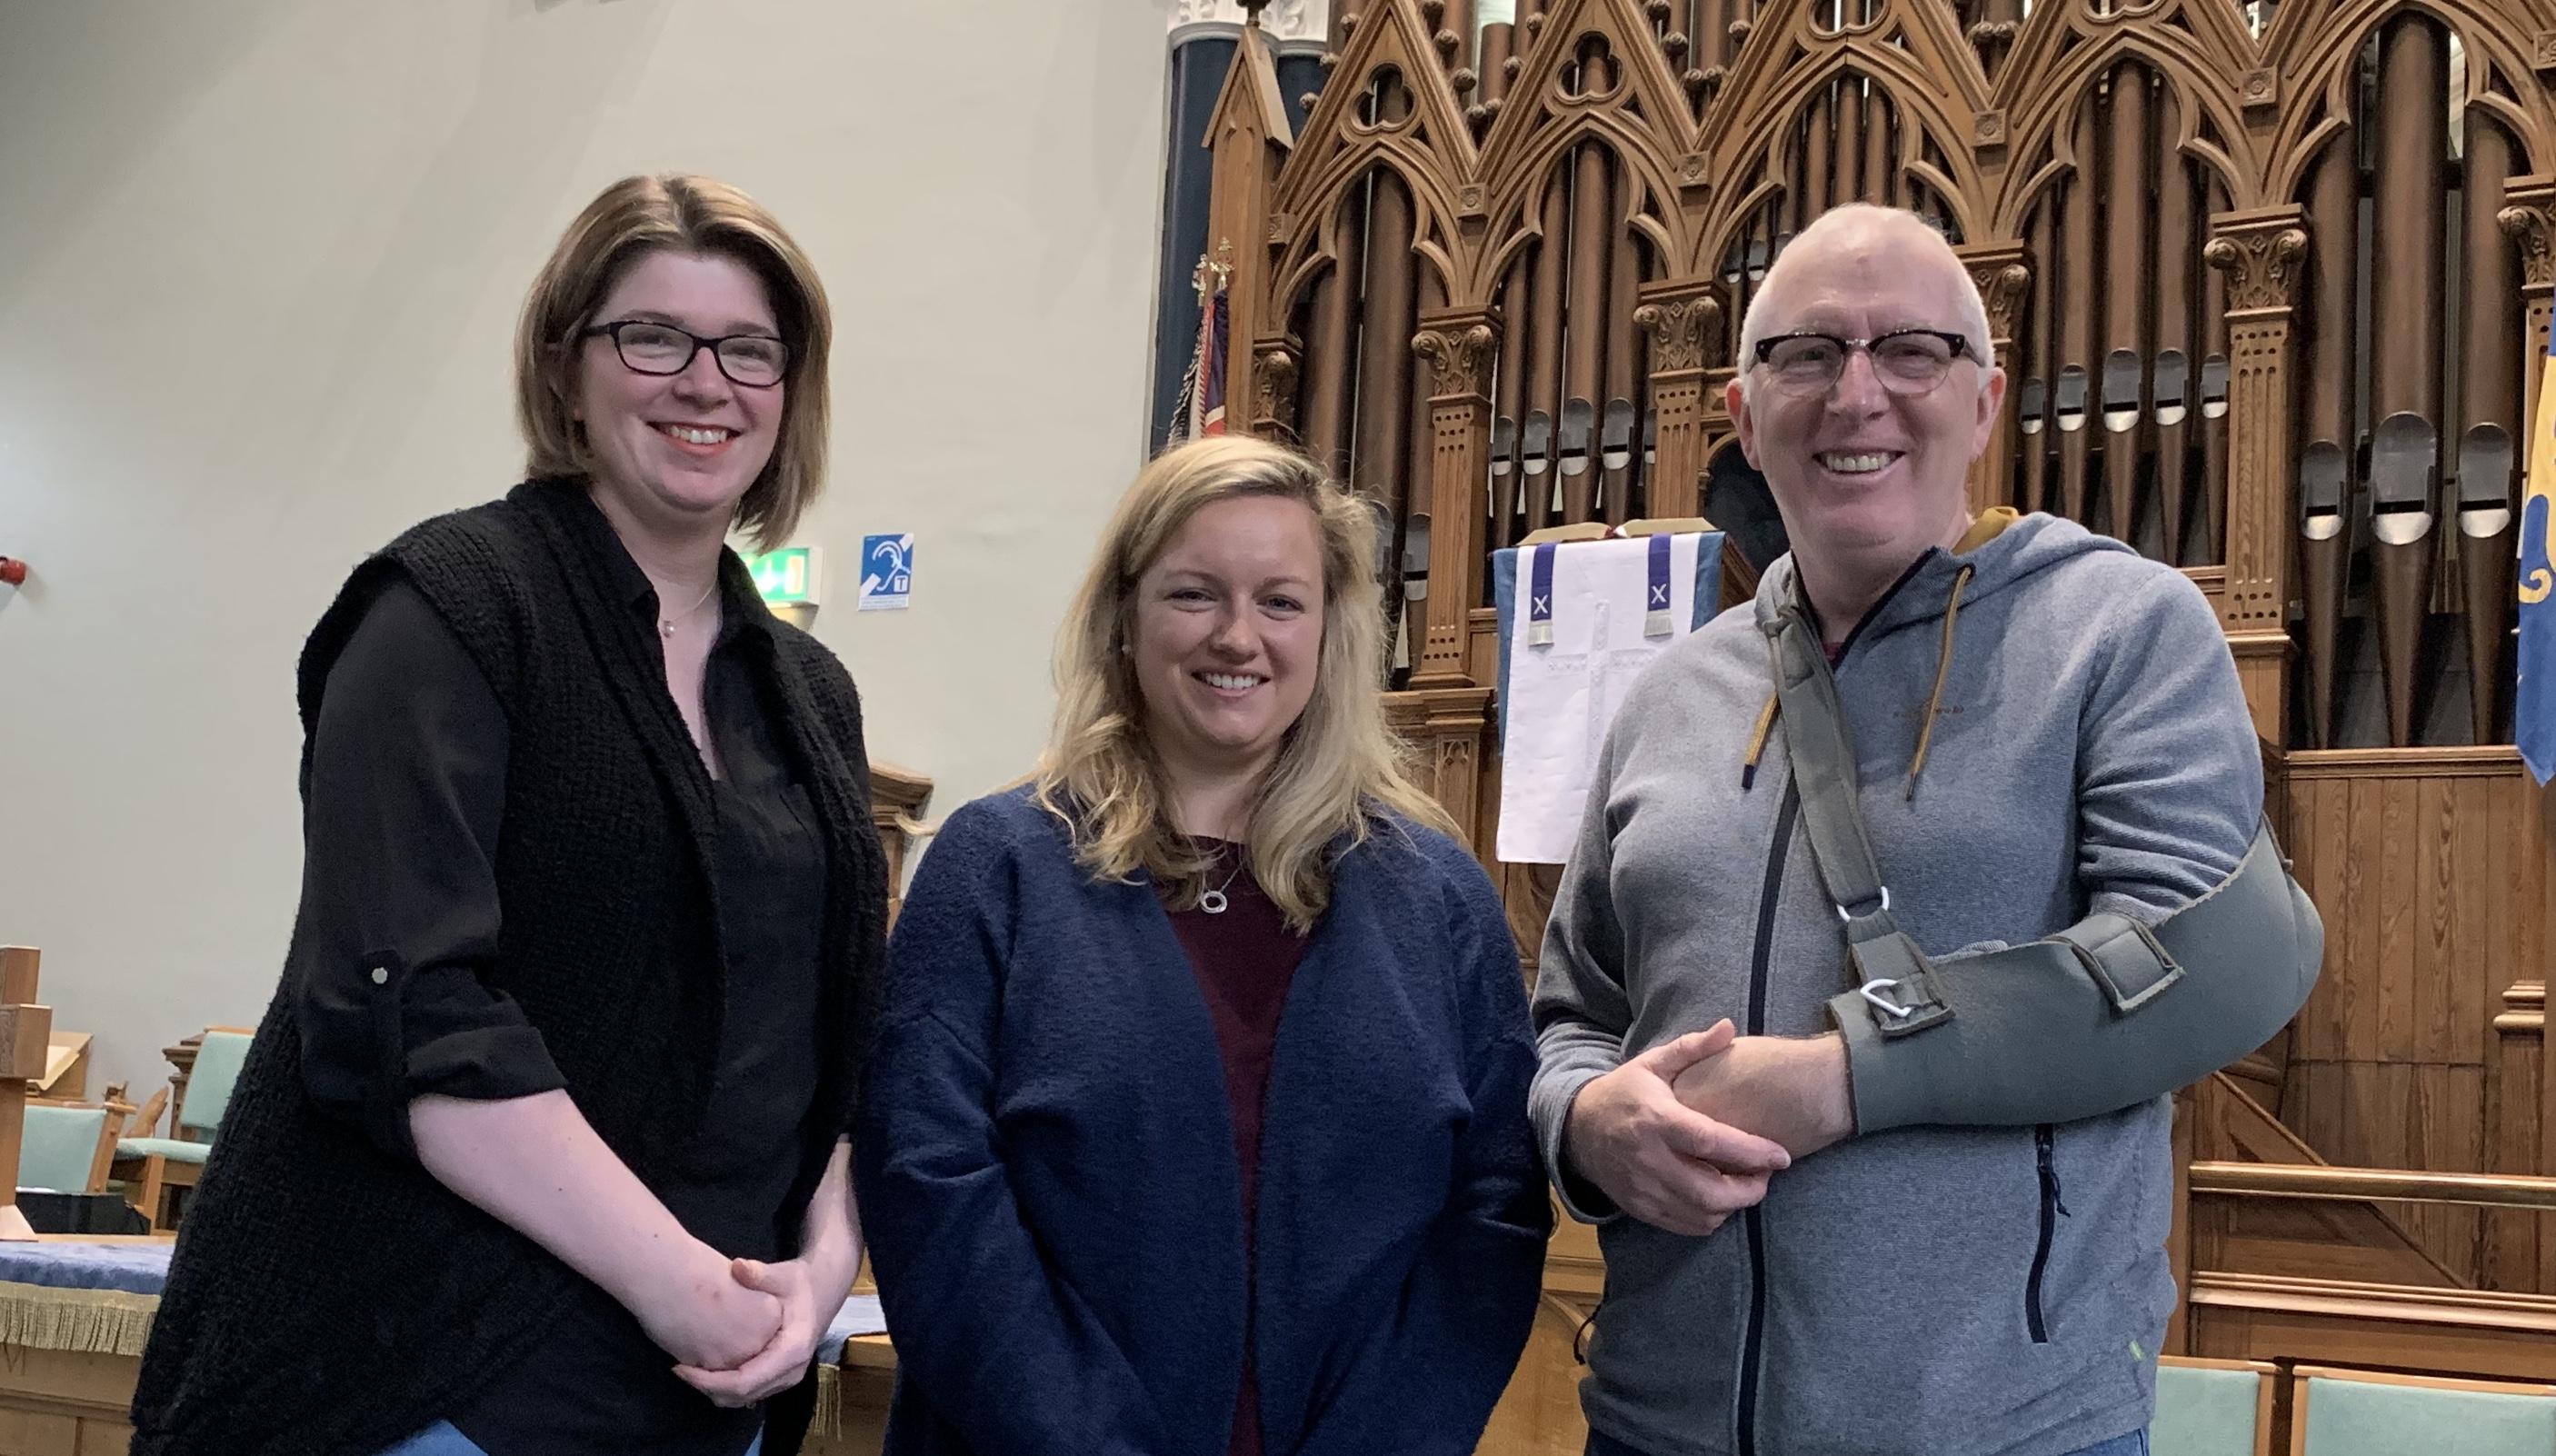 From left: Amanda Logan, member of the St. Andrew's Church mental health working group, Gayle Gabe, community fundraiser SAMH, Martin Fair, minister St. Andrew's Church